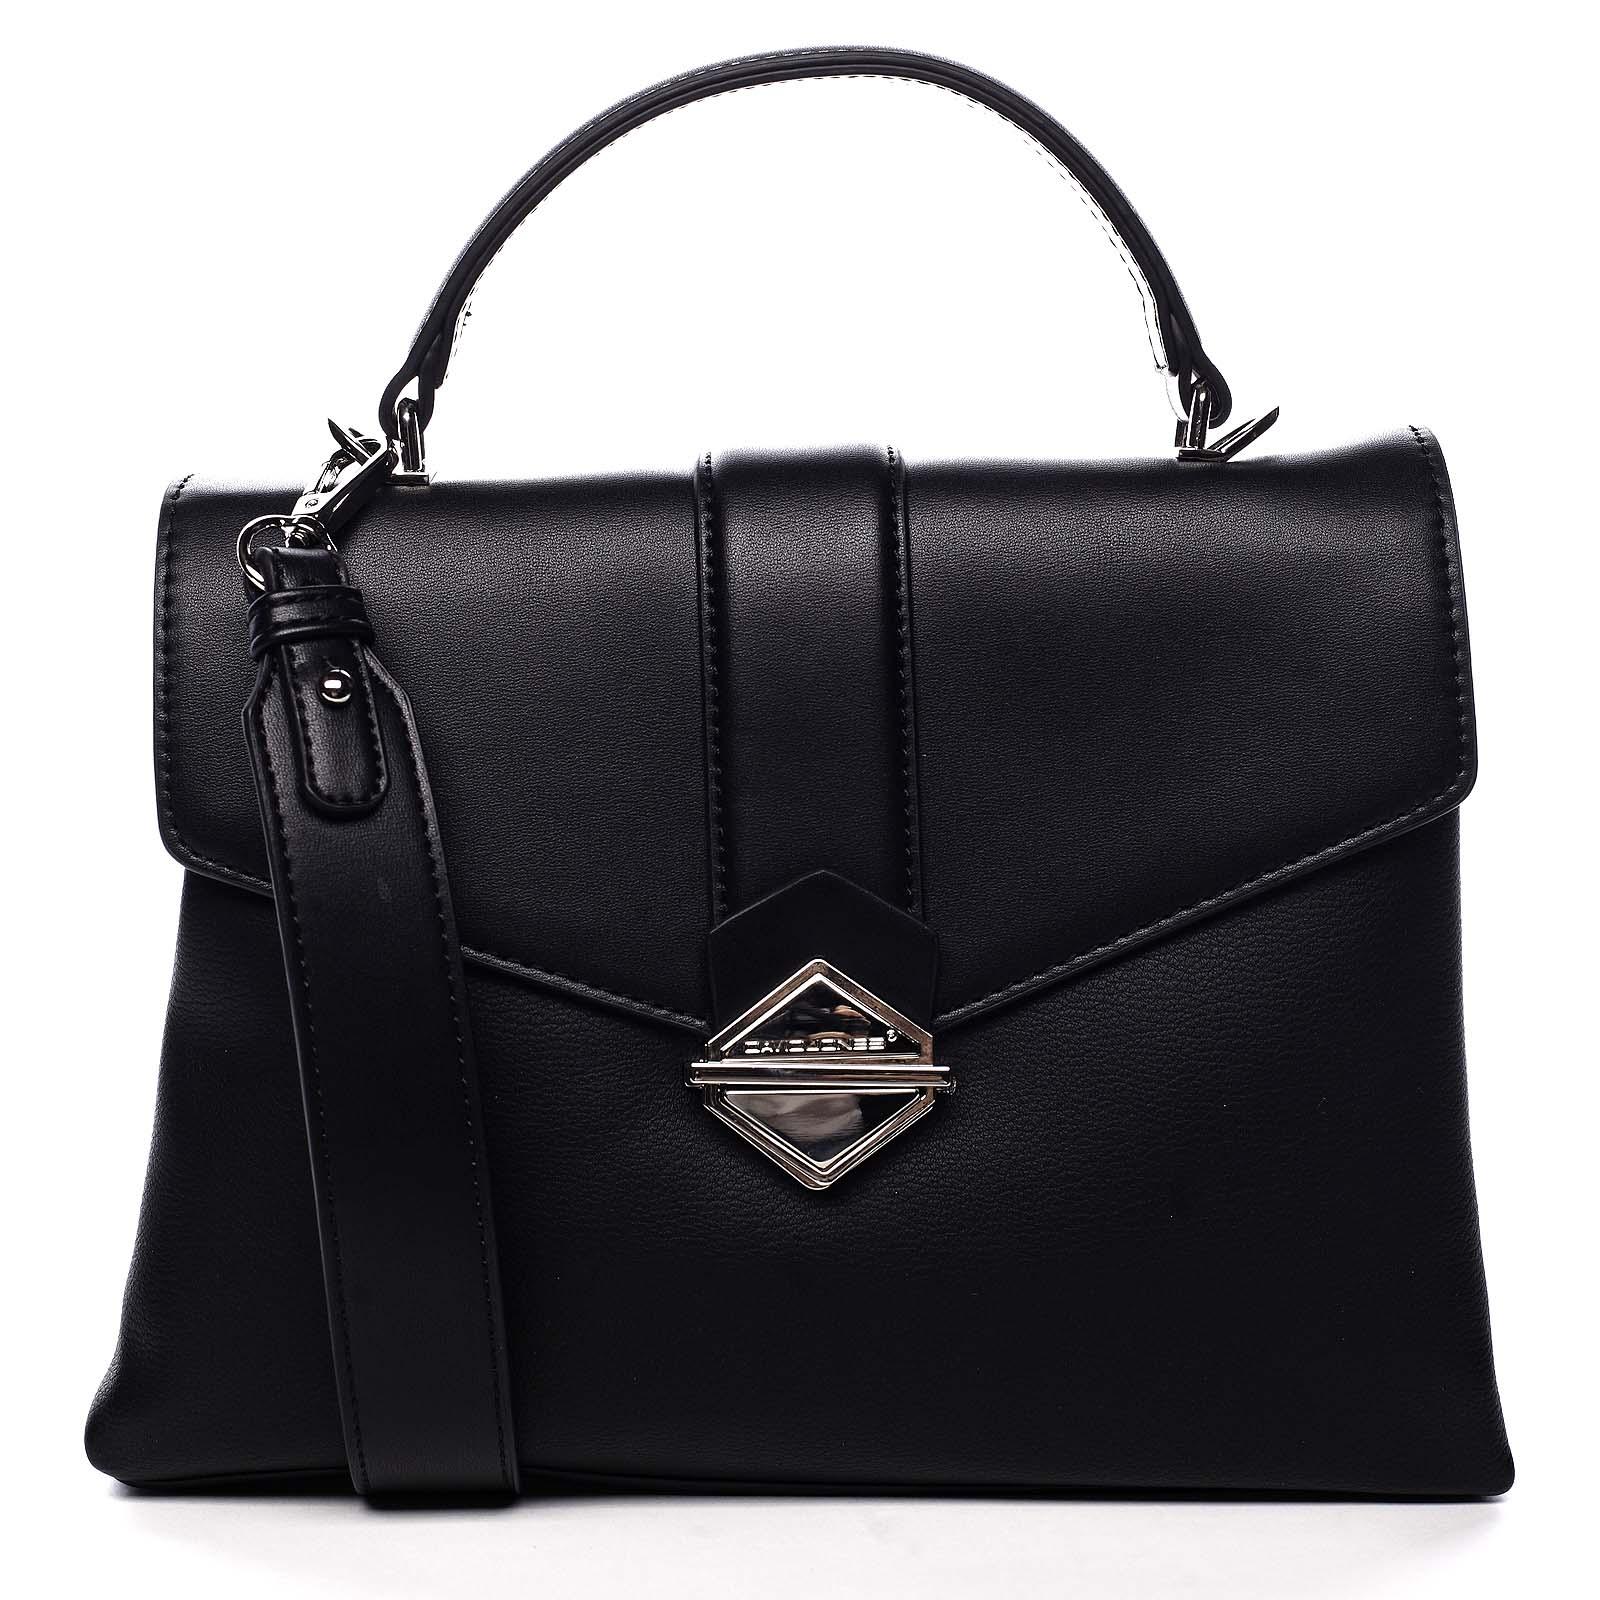 Dámska kabelka do ruky čierna - David Jones Africa čierna